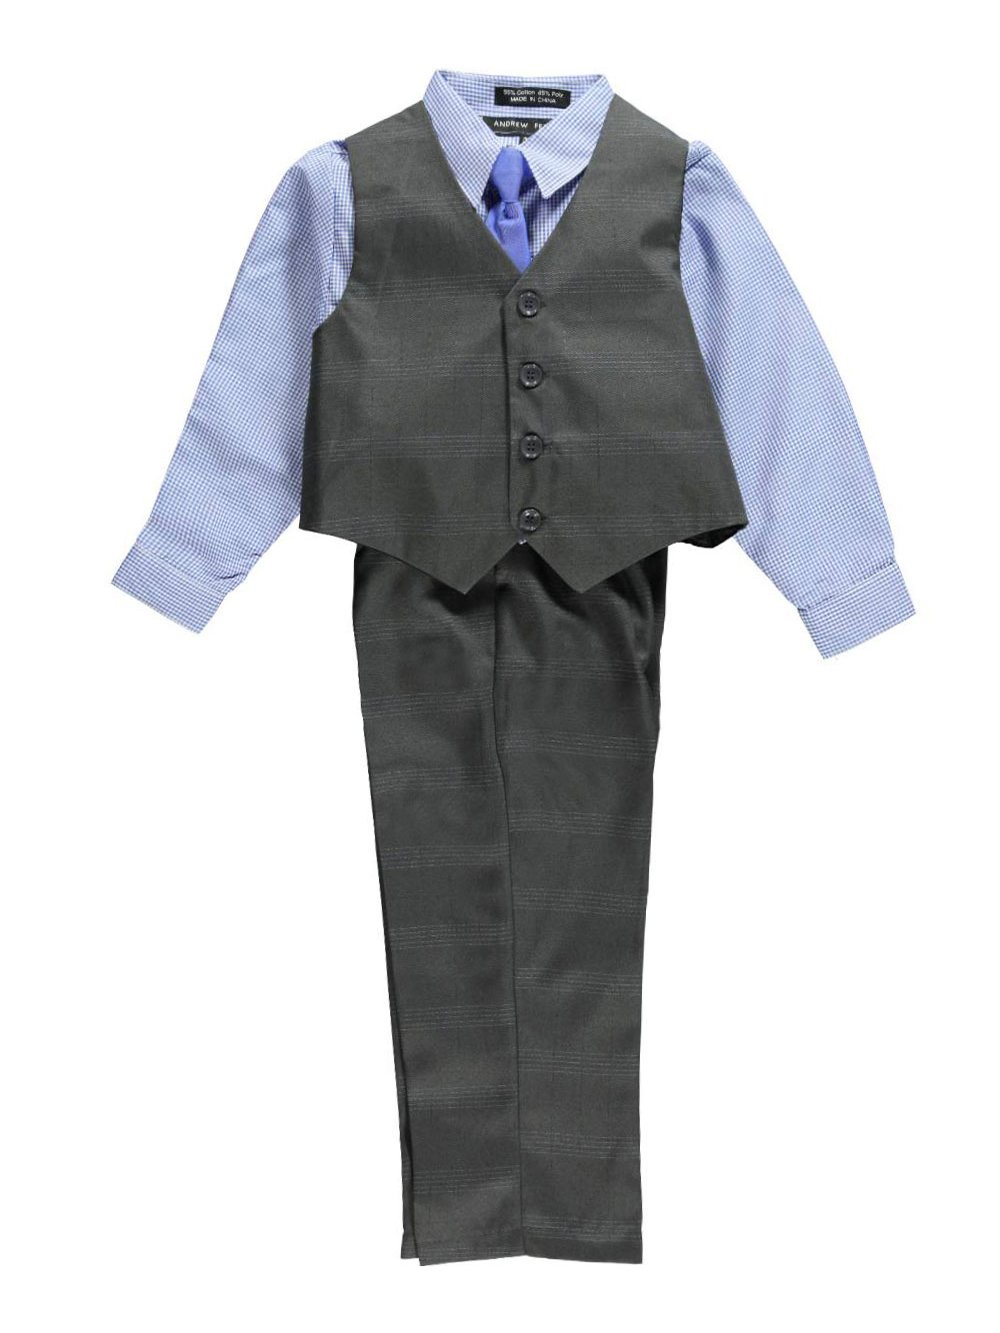 Andrew Fezza Big Boys' Norman 4-Piece Vest Set - charcoal gray, 10